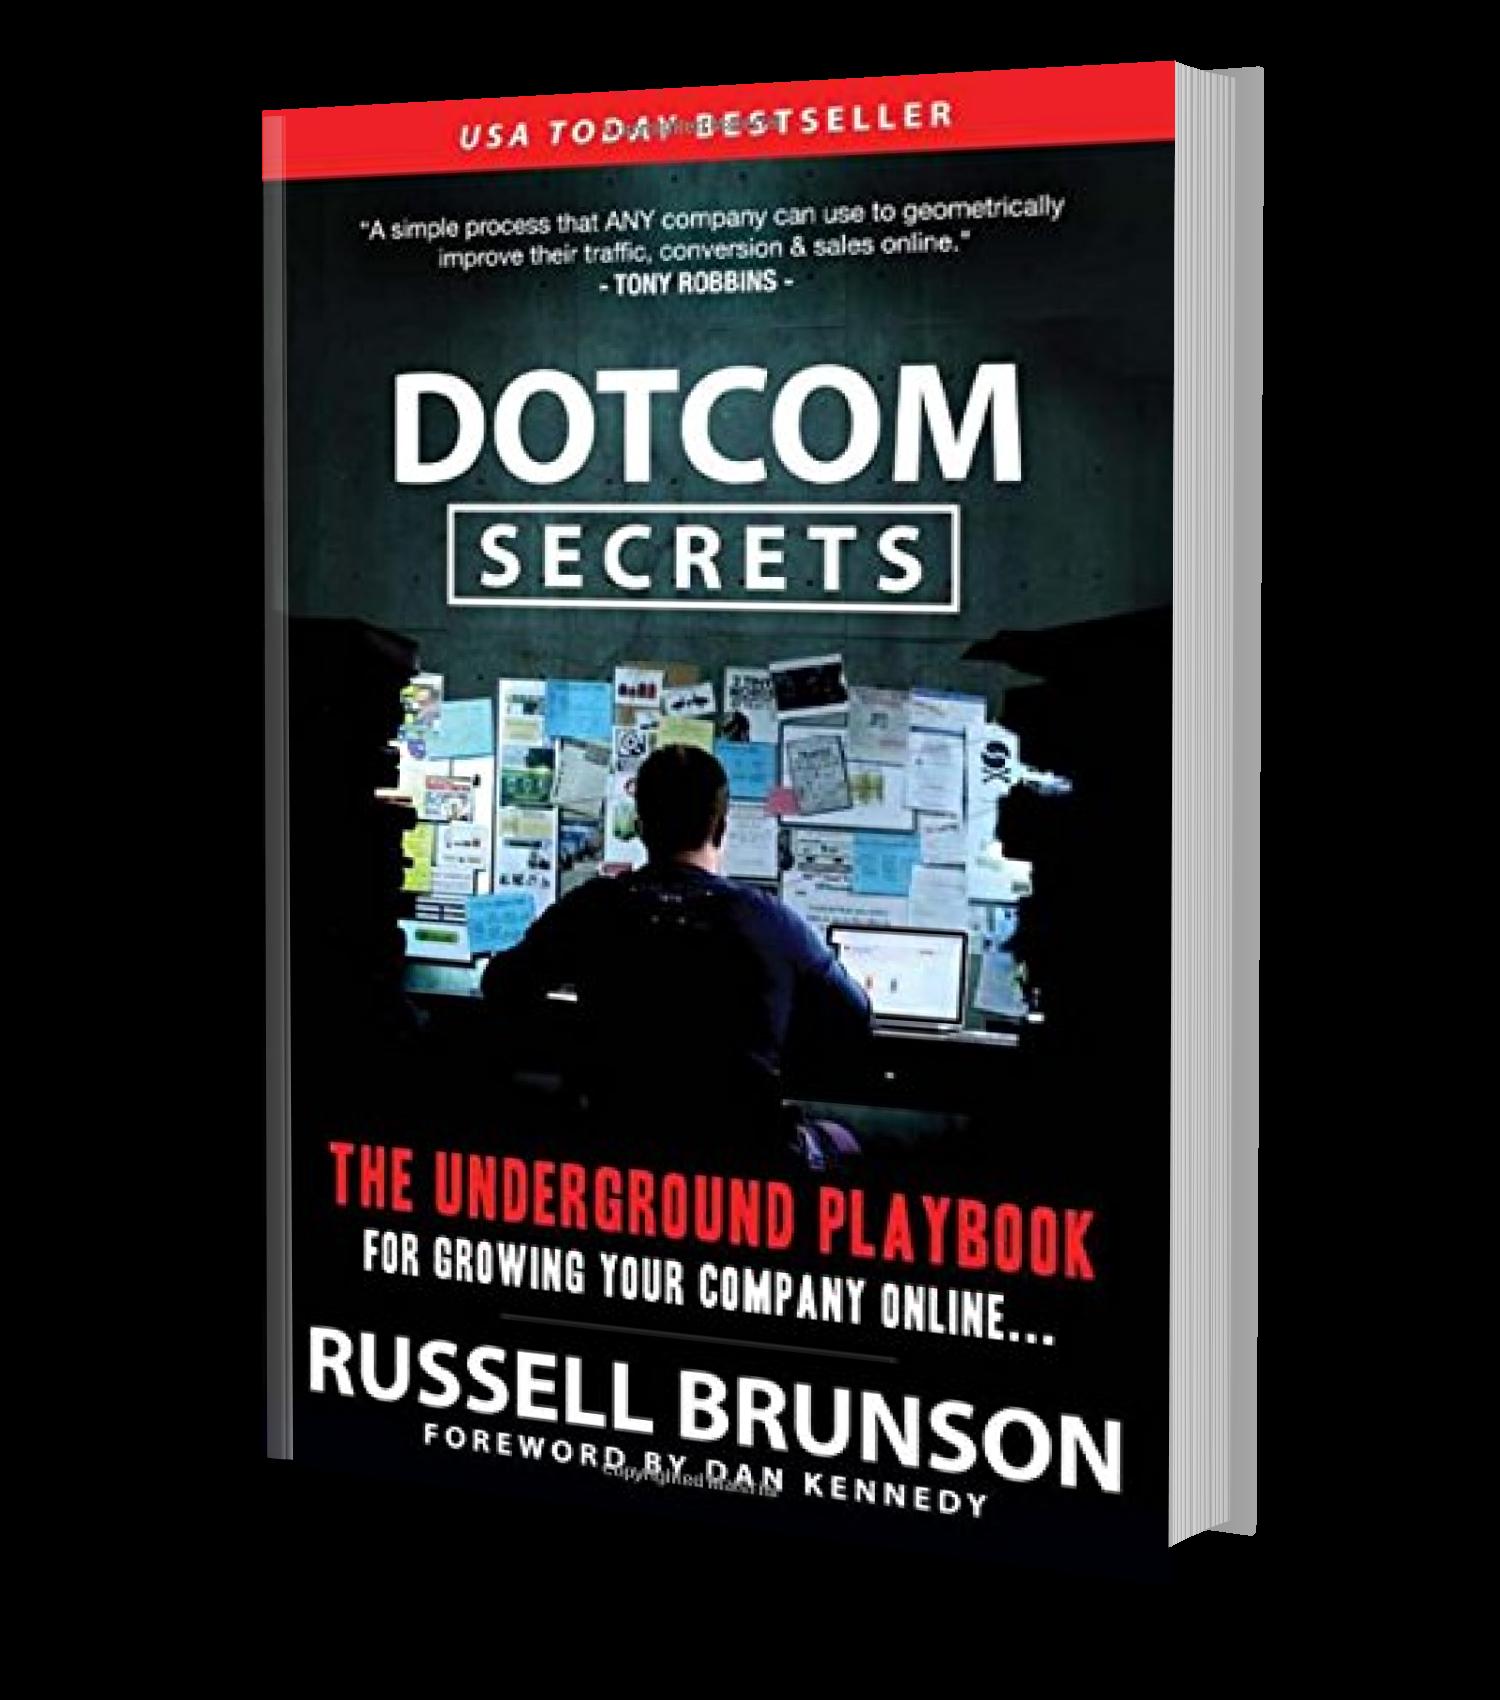 dotcom book